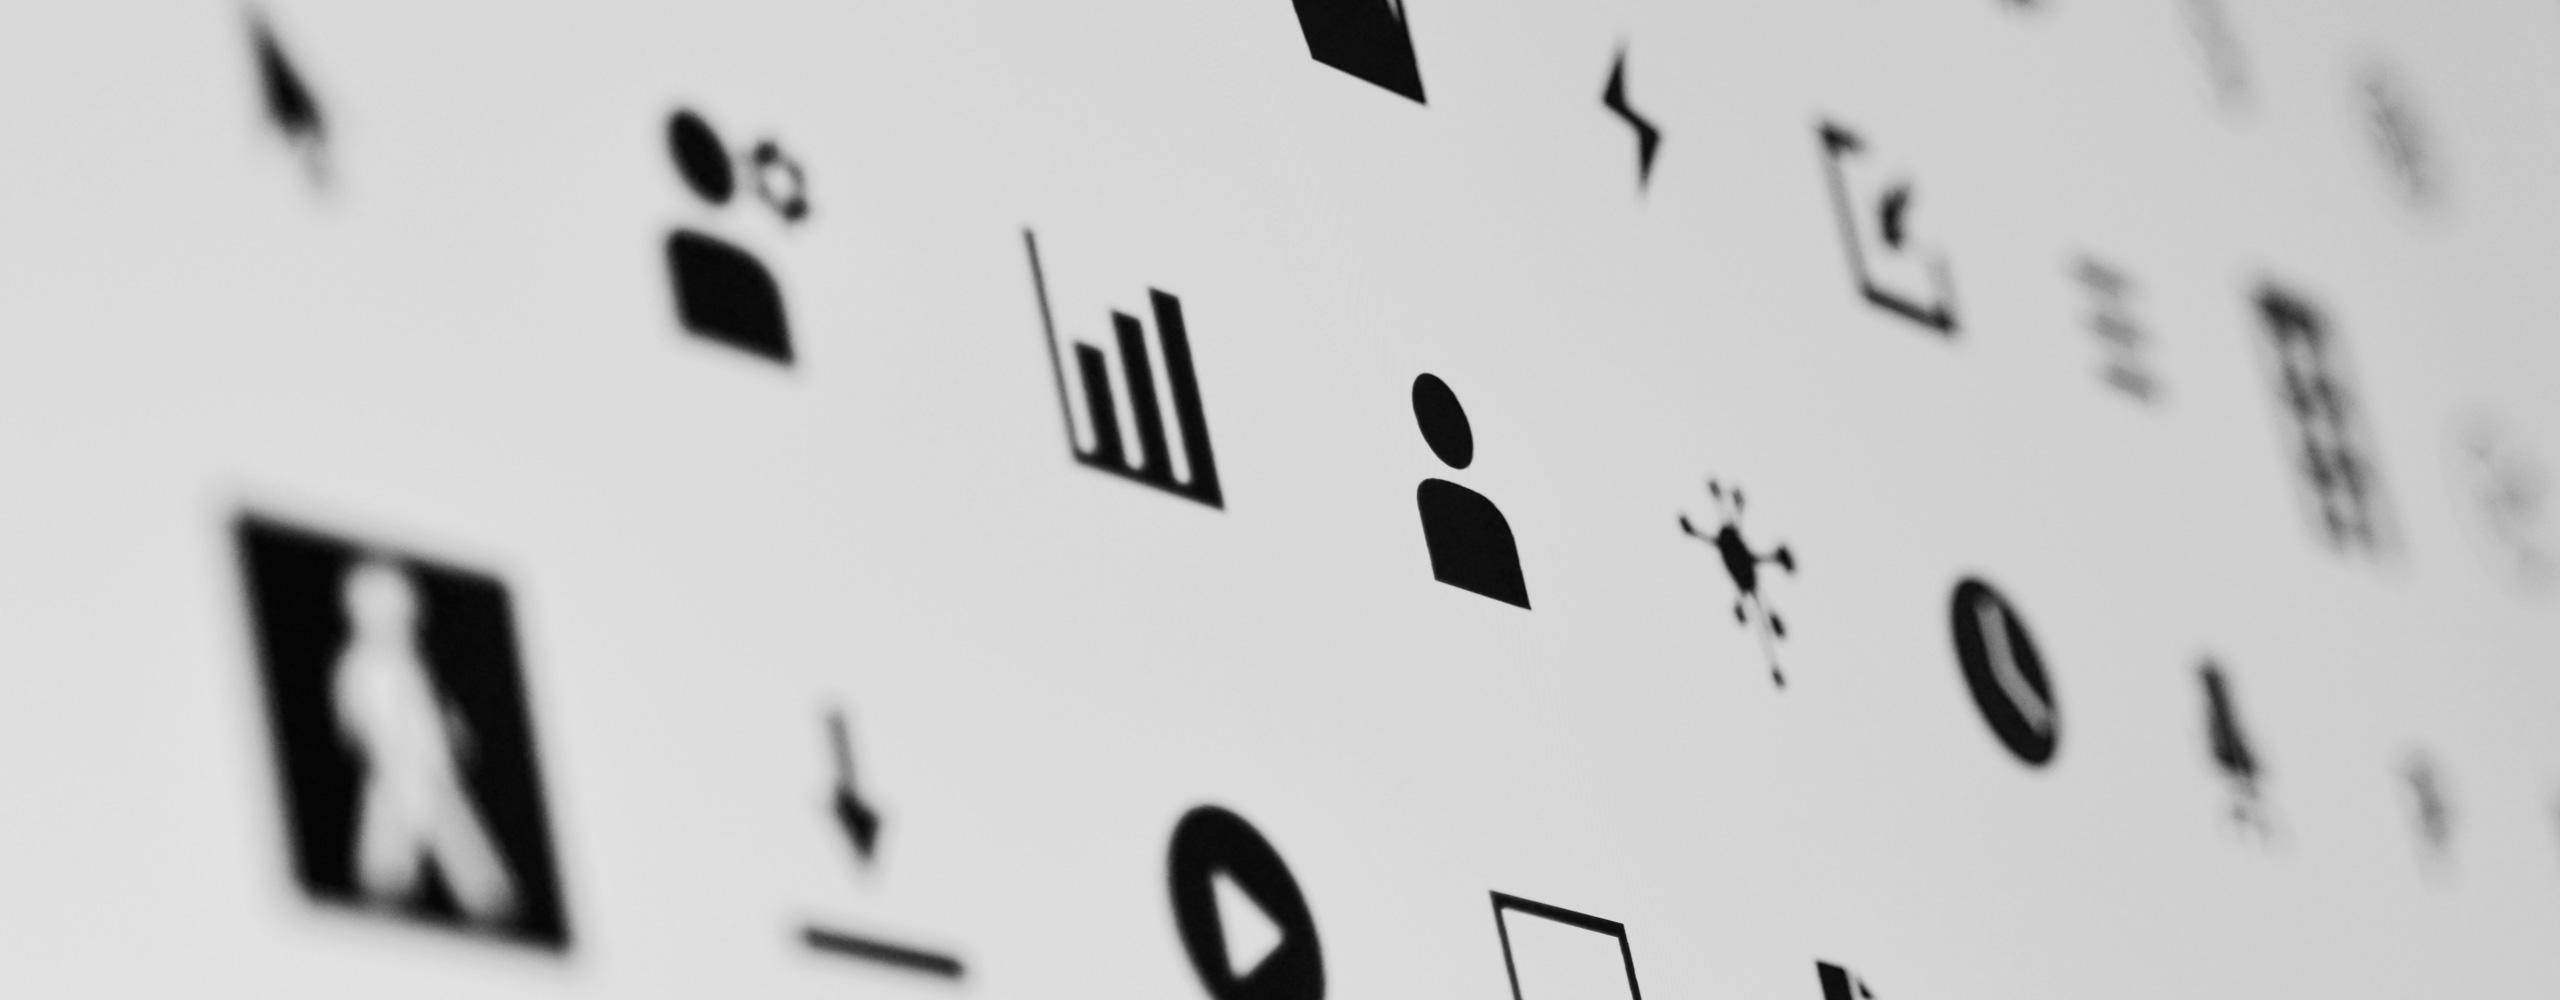 Grenke Piktogramme Bildschirm Bourdonné Design